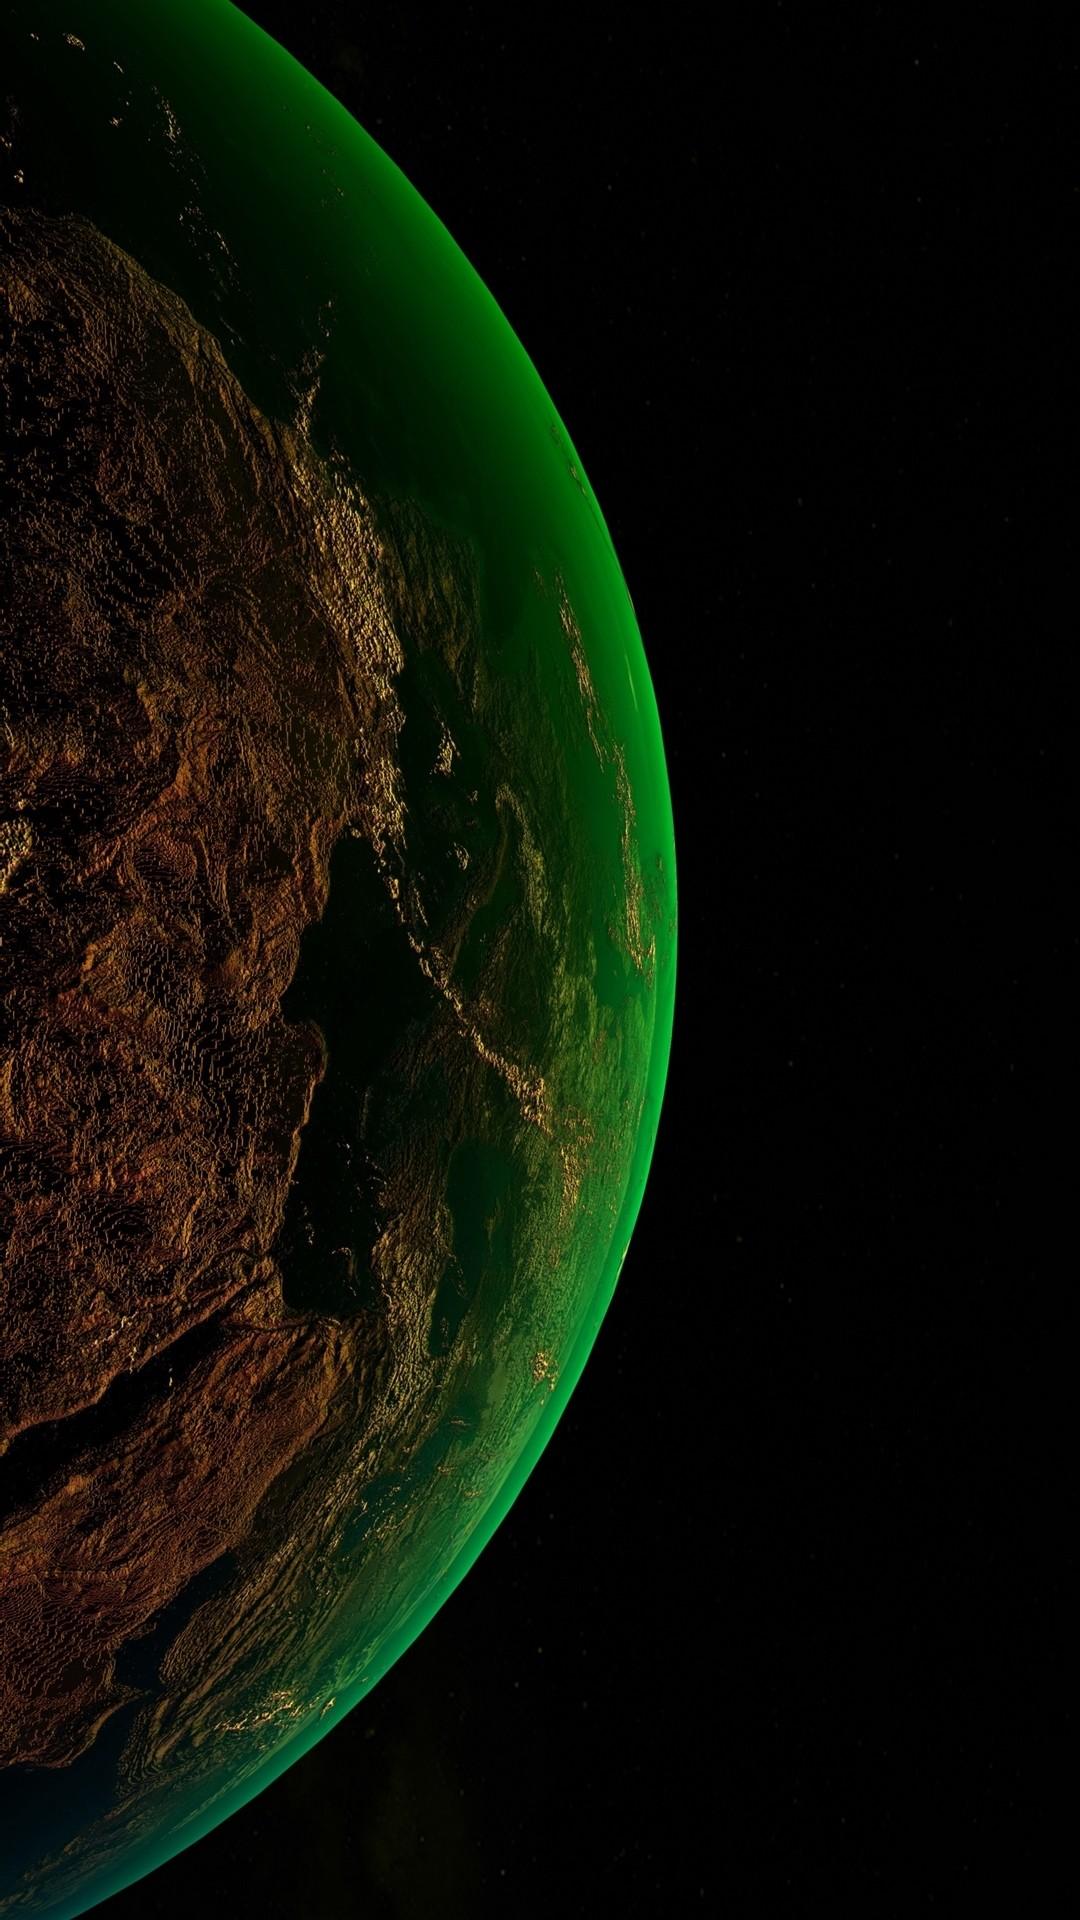 Planet iPhone hd wallpaper